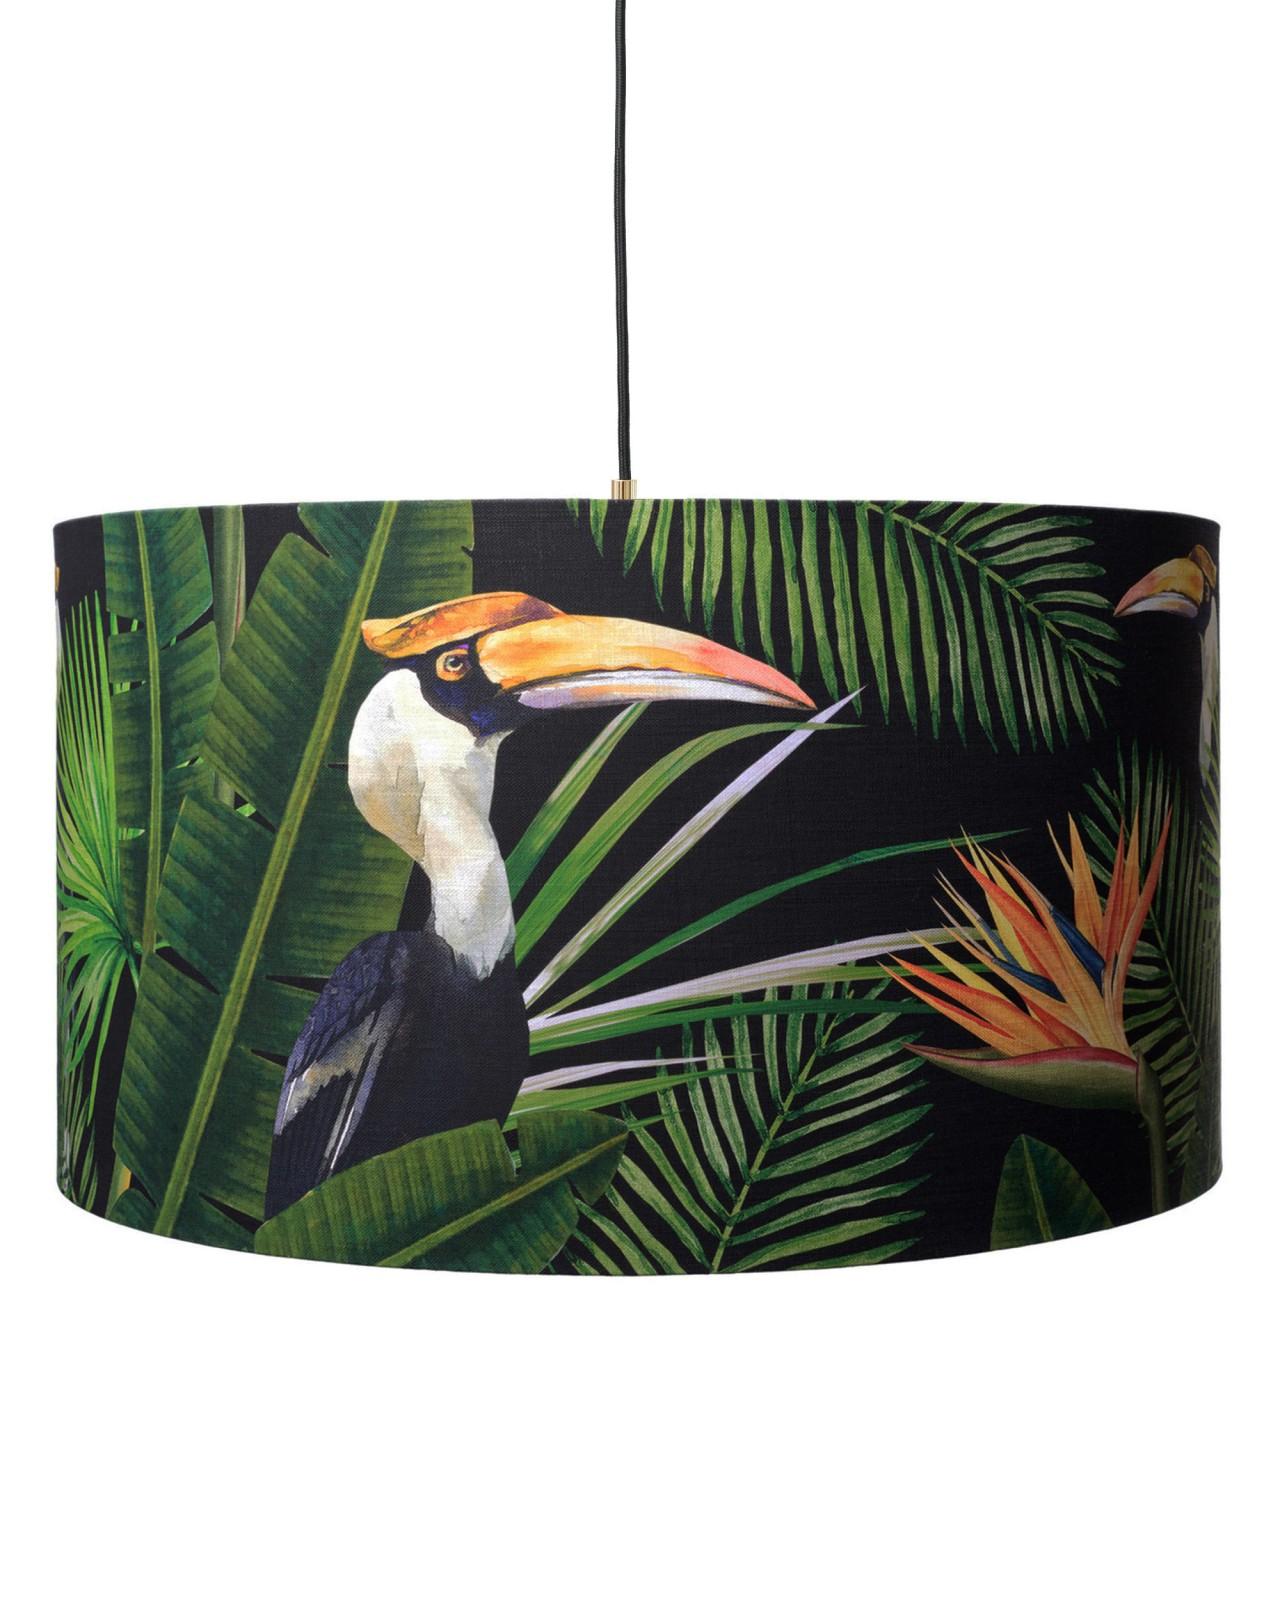 BIRDS OF PARADISE Pendant Lamp